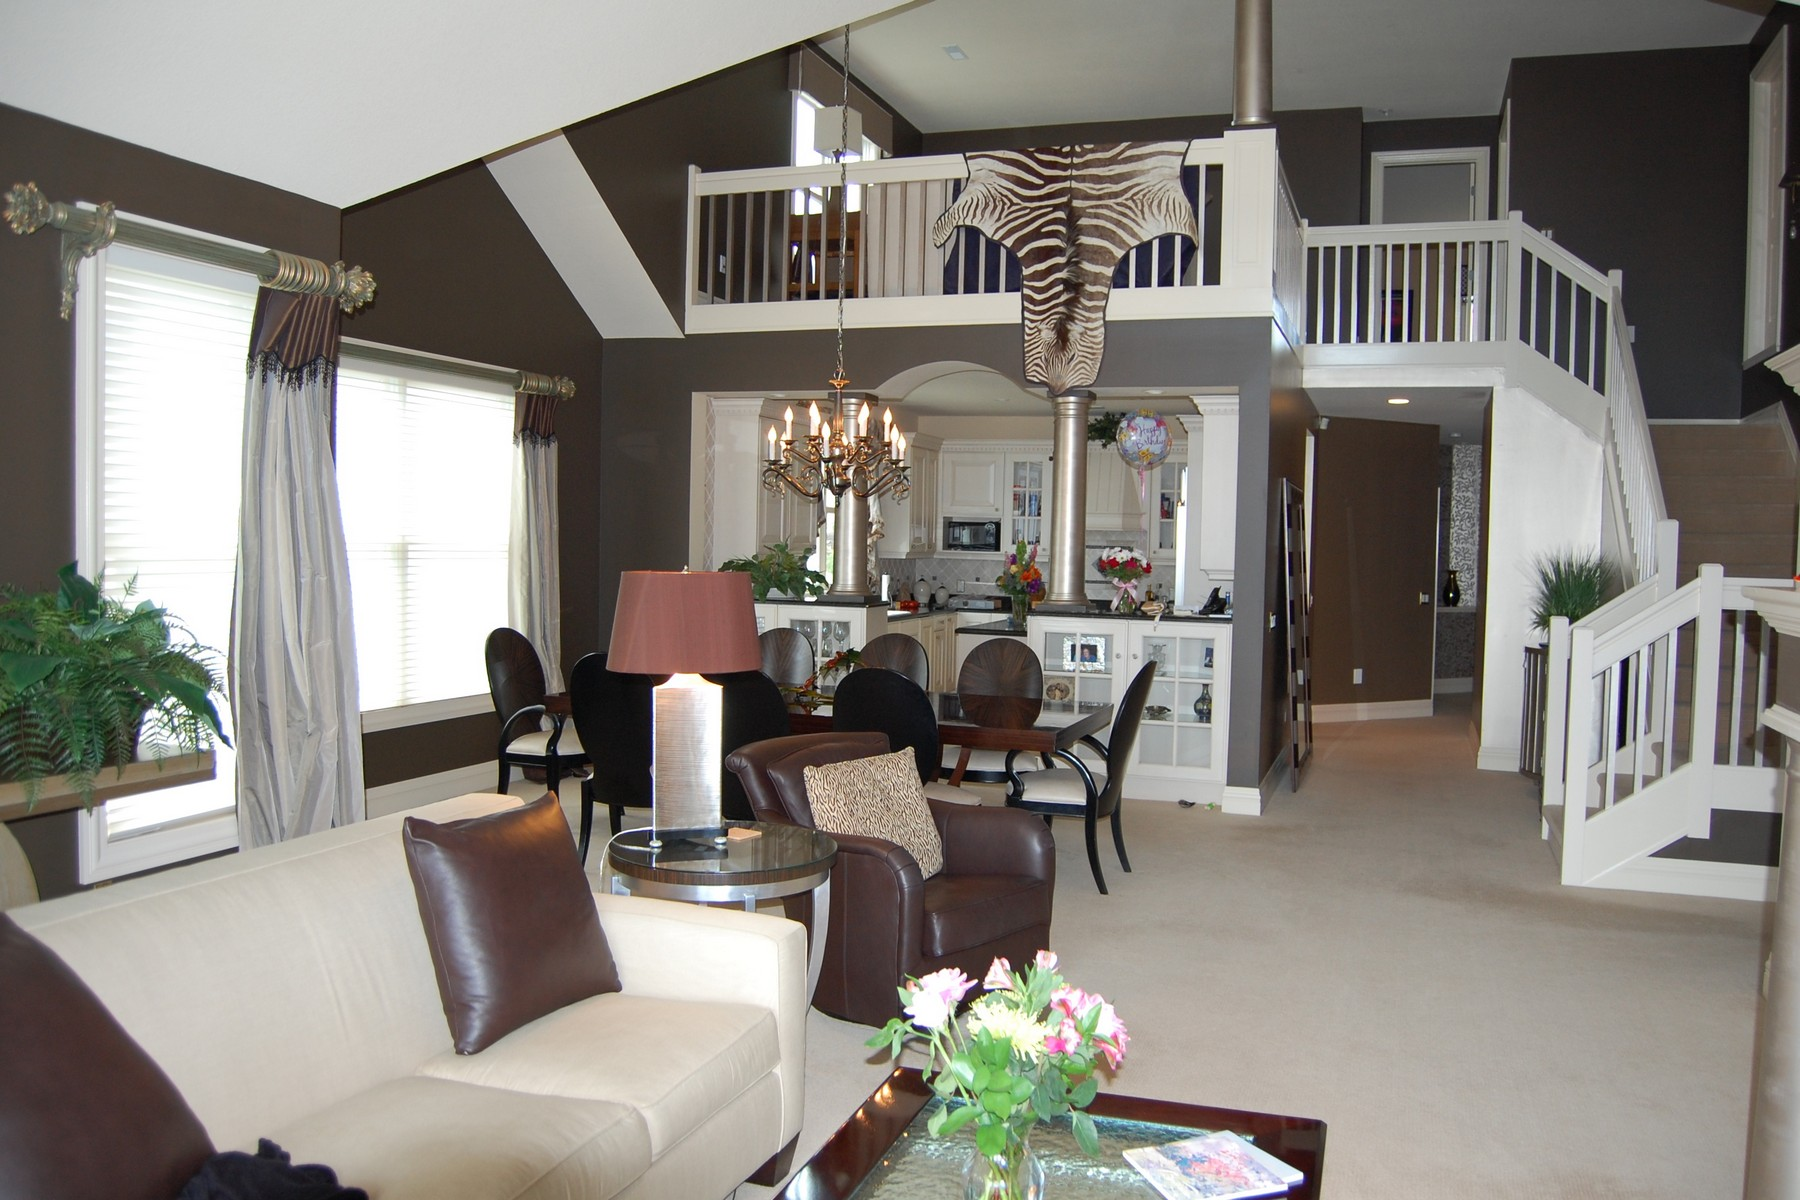 Condominium for Sale at Bay Harbor Lake View Condo 4100 Harborview Ridge Bay Harbor, Michigan 49770 United States